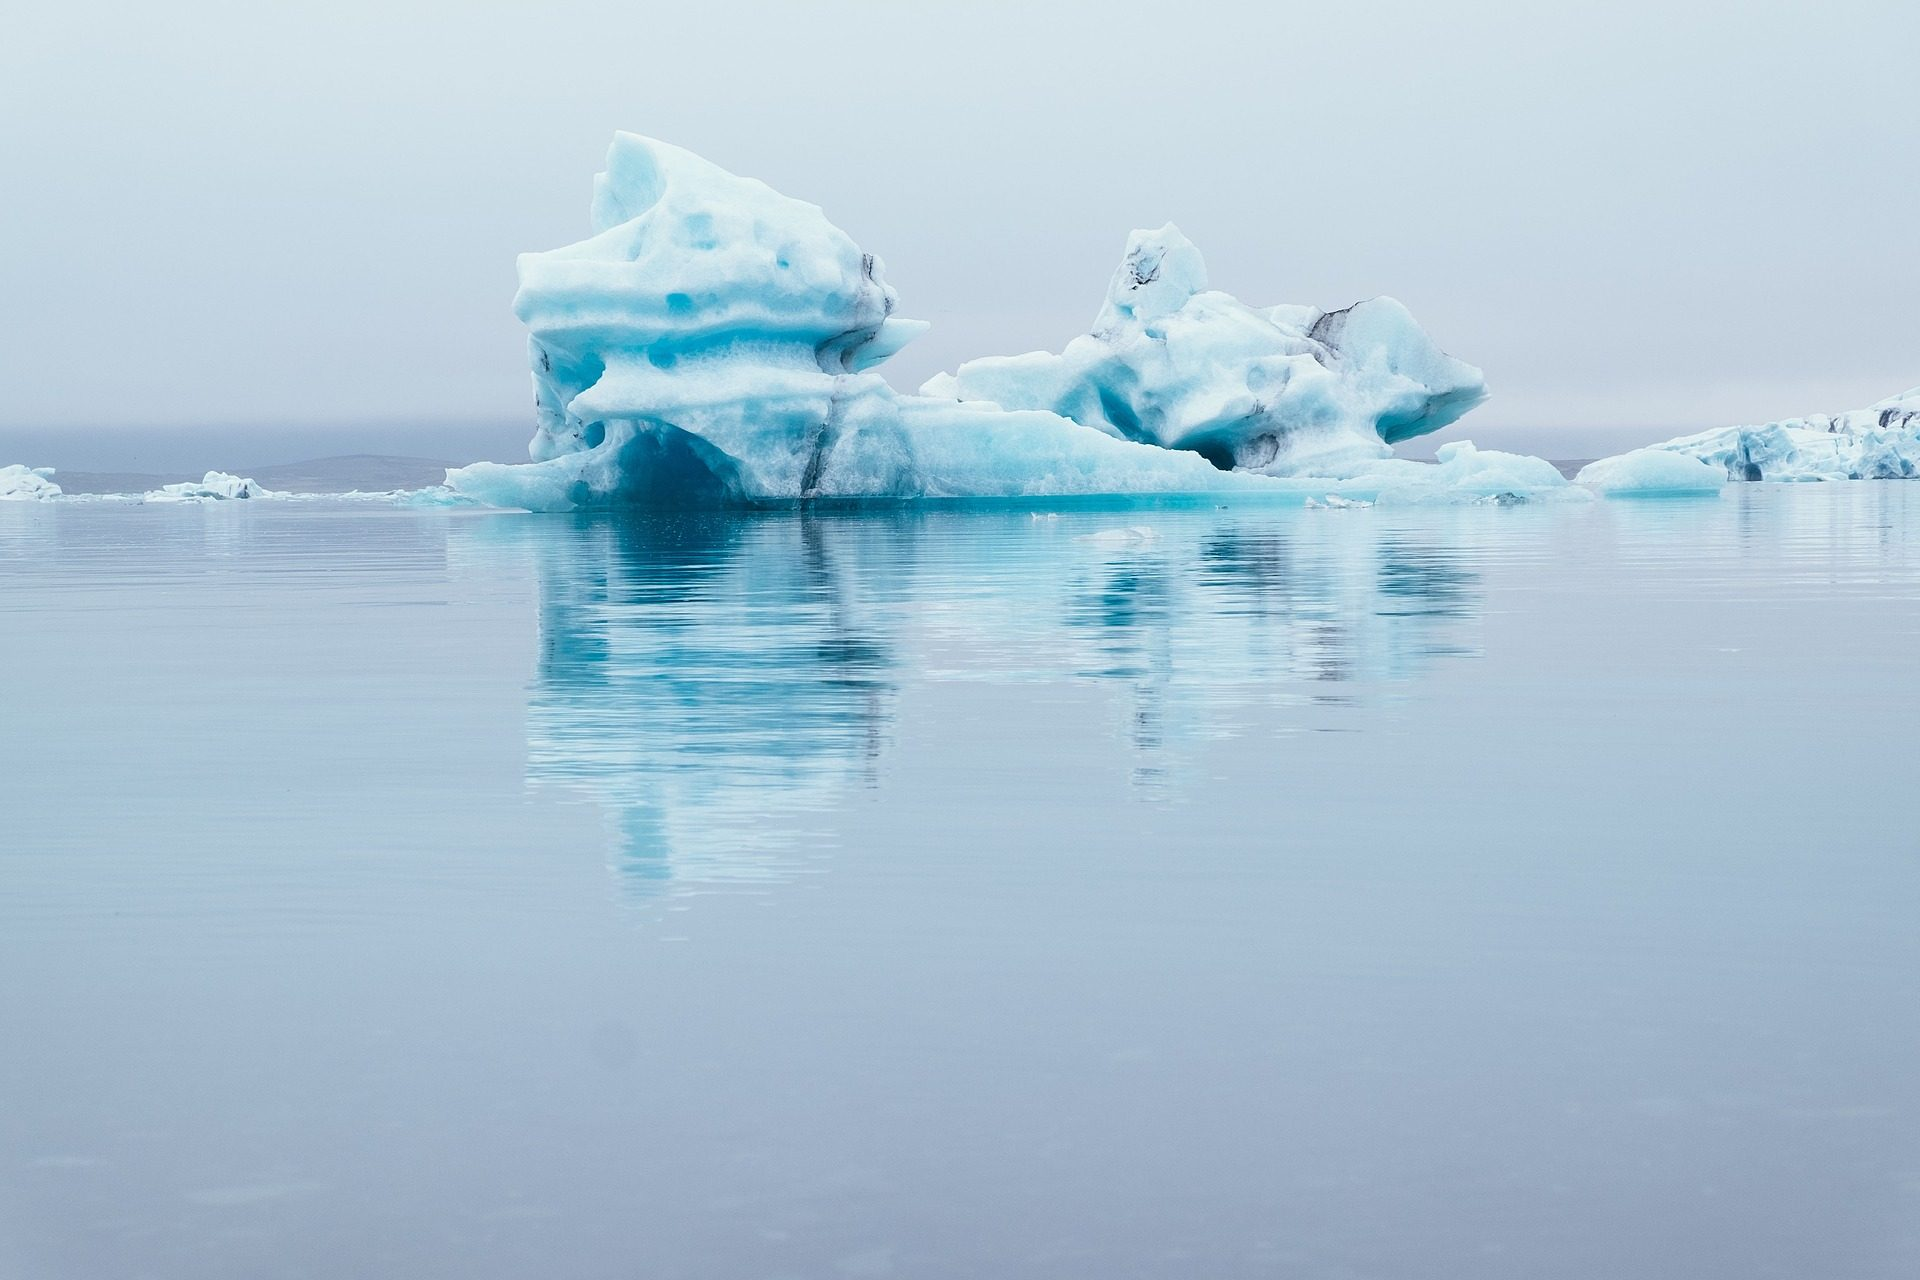 Айсберг, Море, лед, снег, Серенити - Обои HD - Профессор falken.com